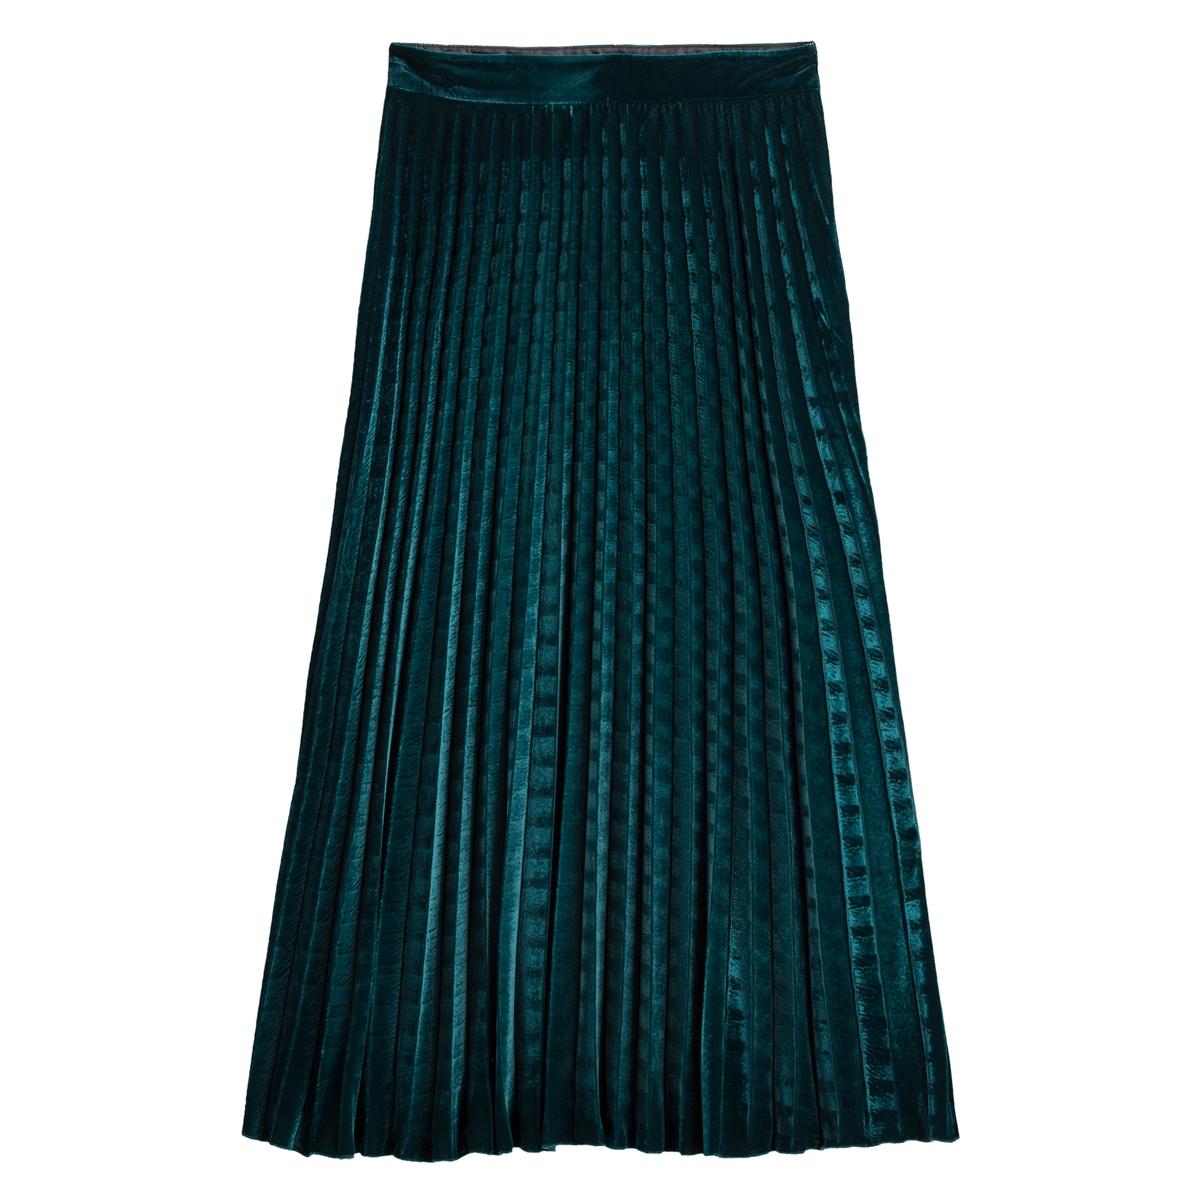 Falda plisada larga de terciopelo